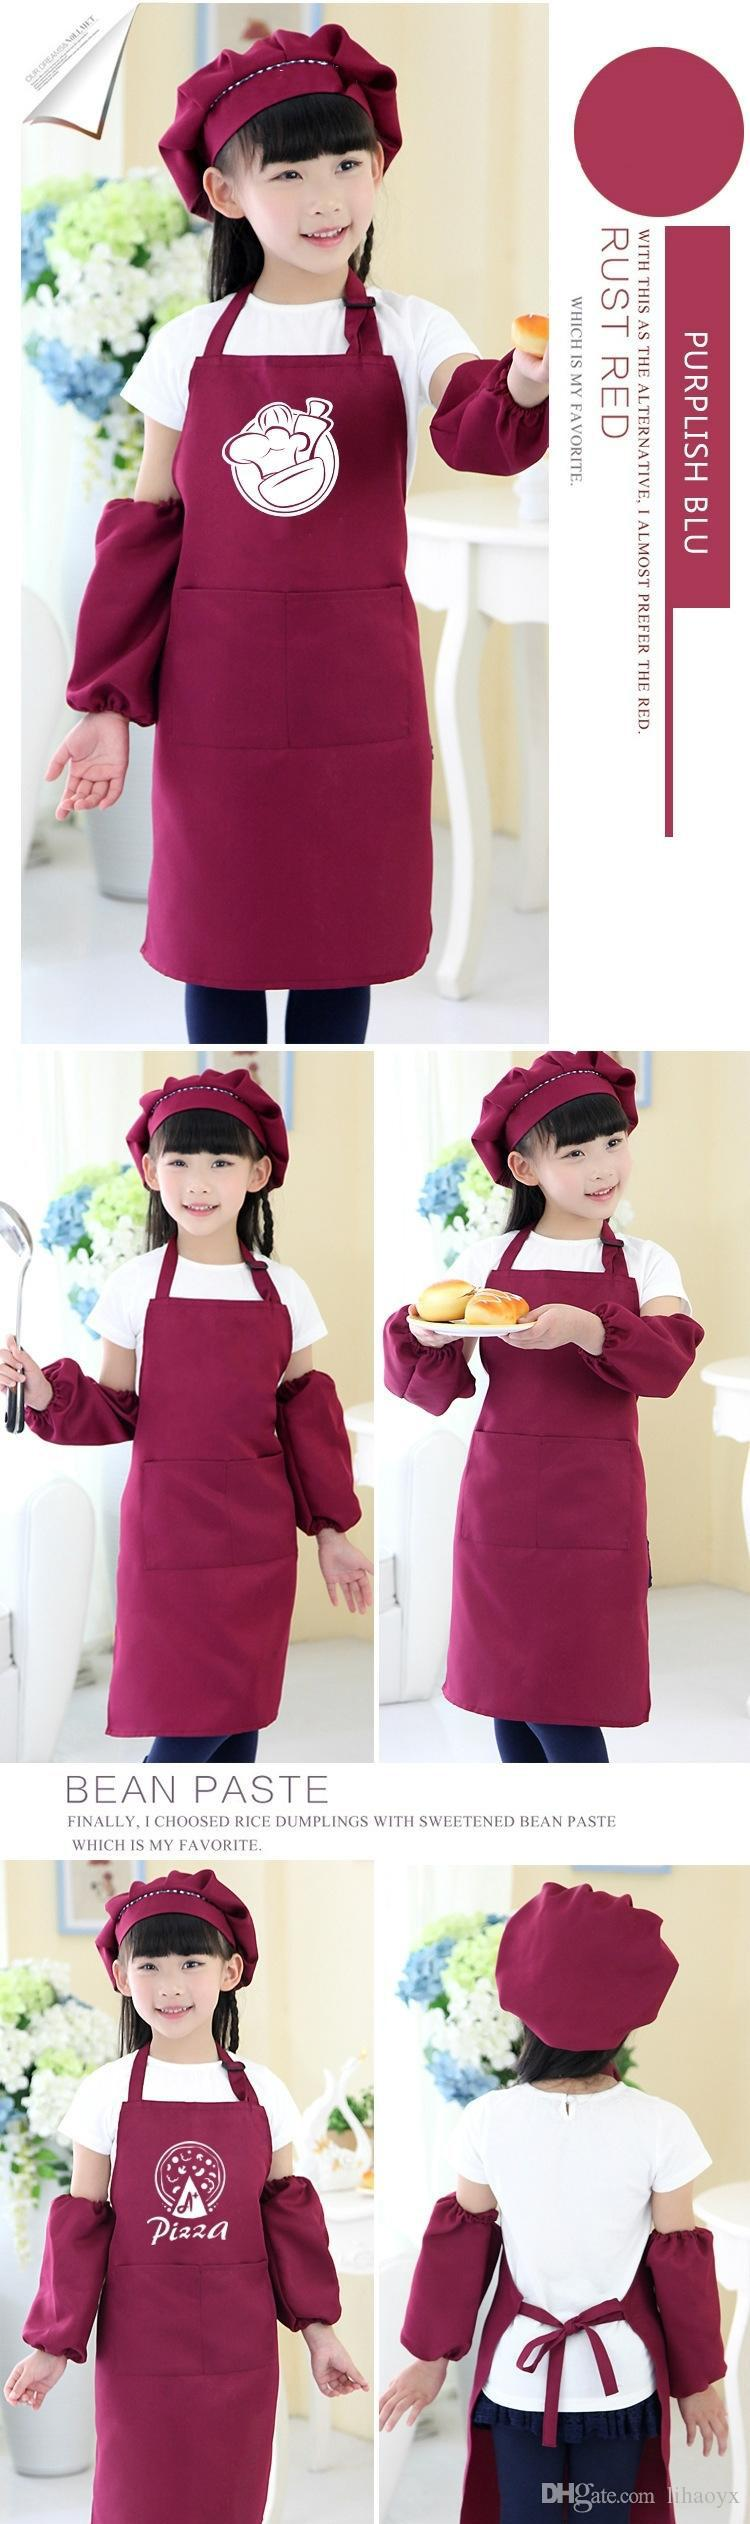 Hot sale free delivery children's apron pocket craft cooking baking art painting children's kitchen dining bib pocket JD001